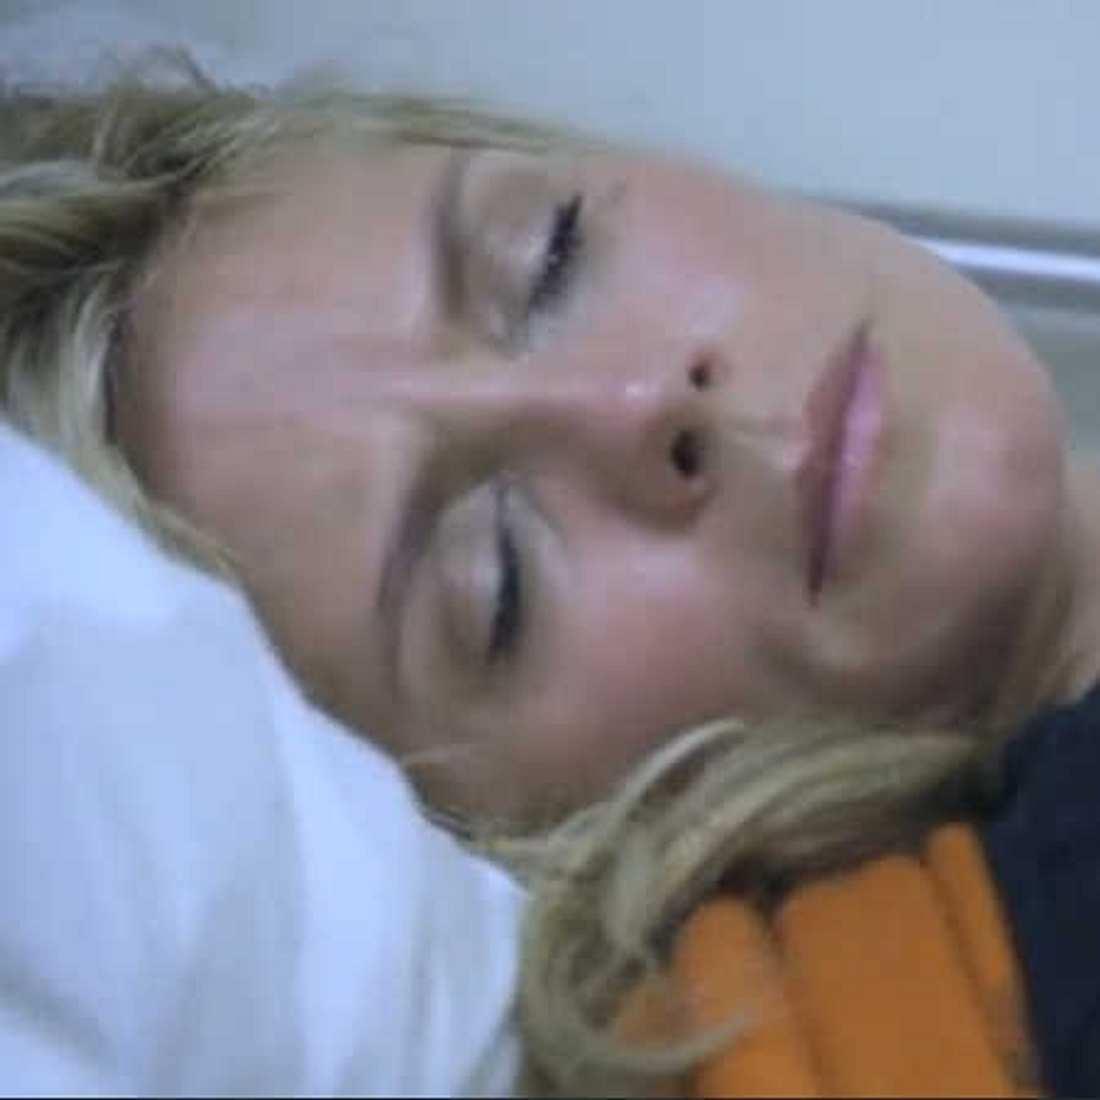 Heidi Klum im Krankenhaus